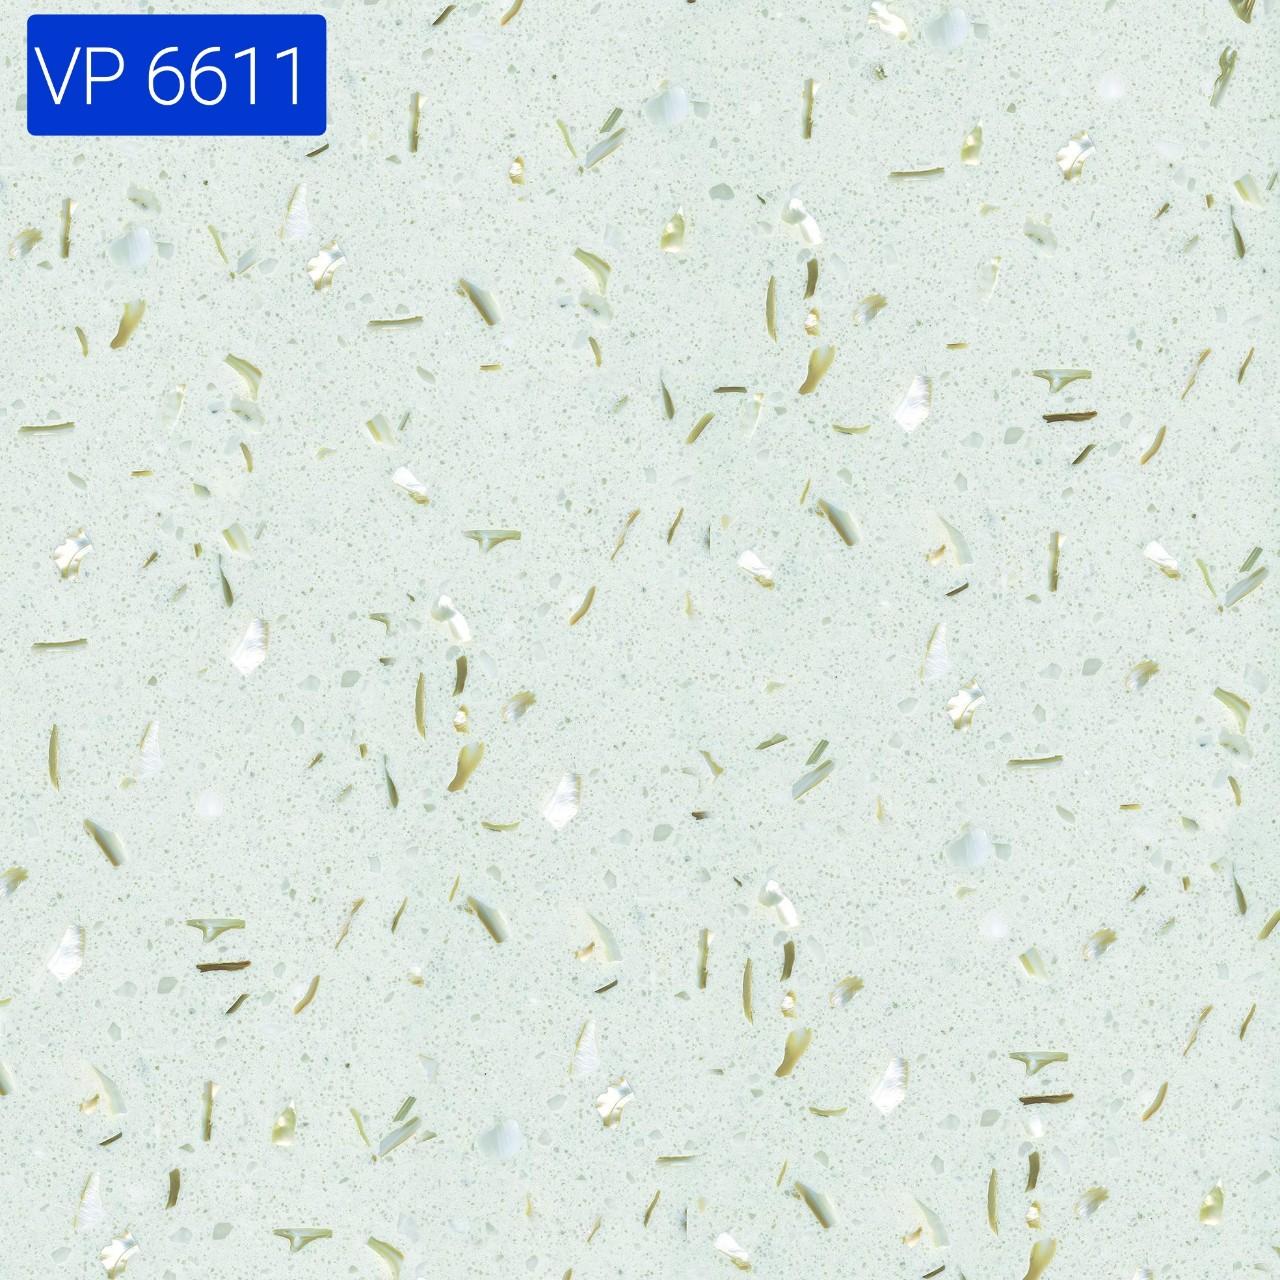 VP6611